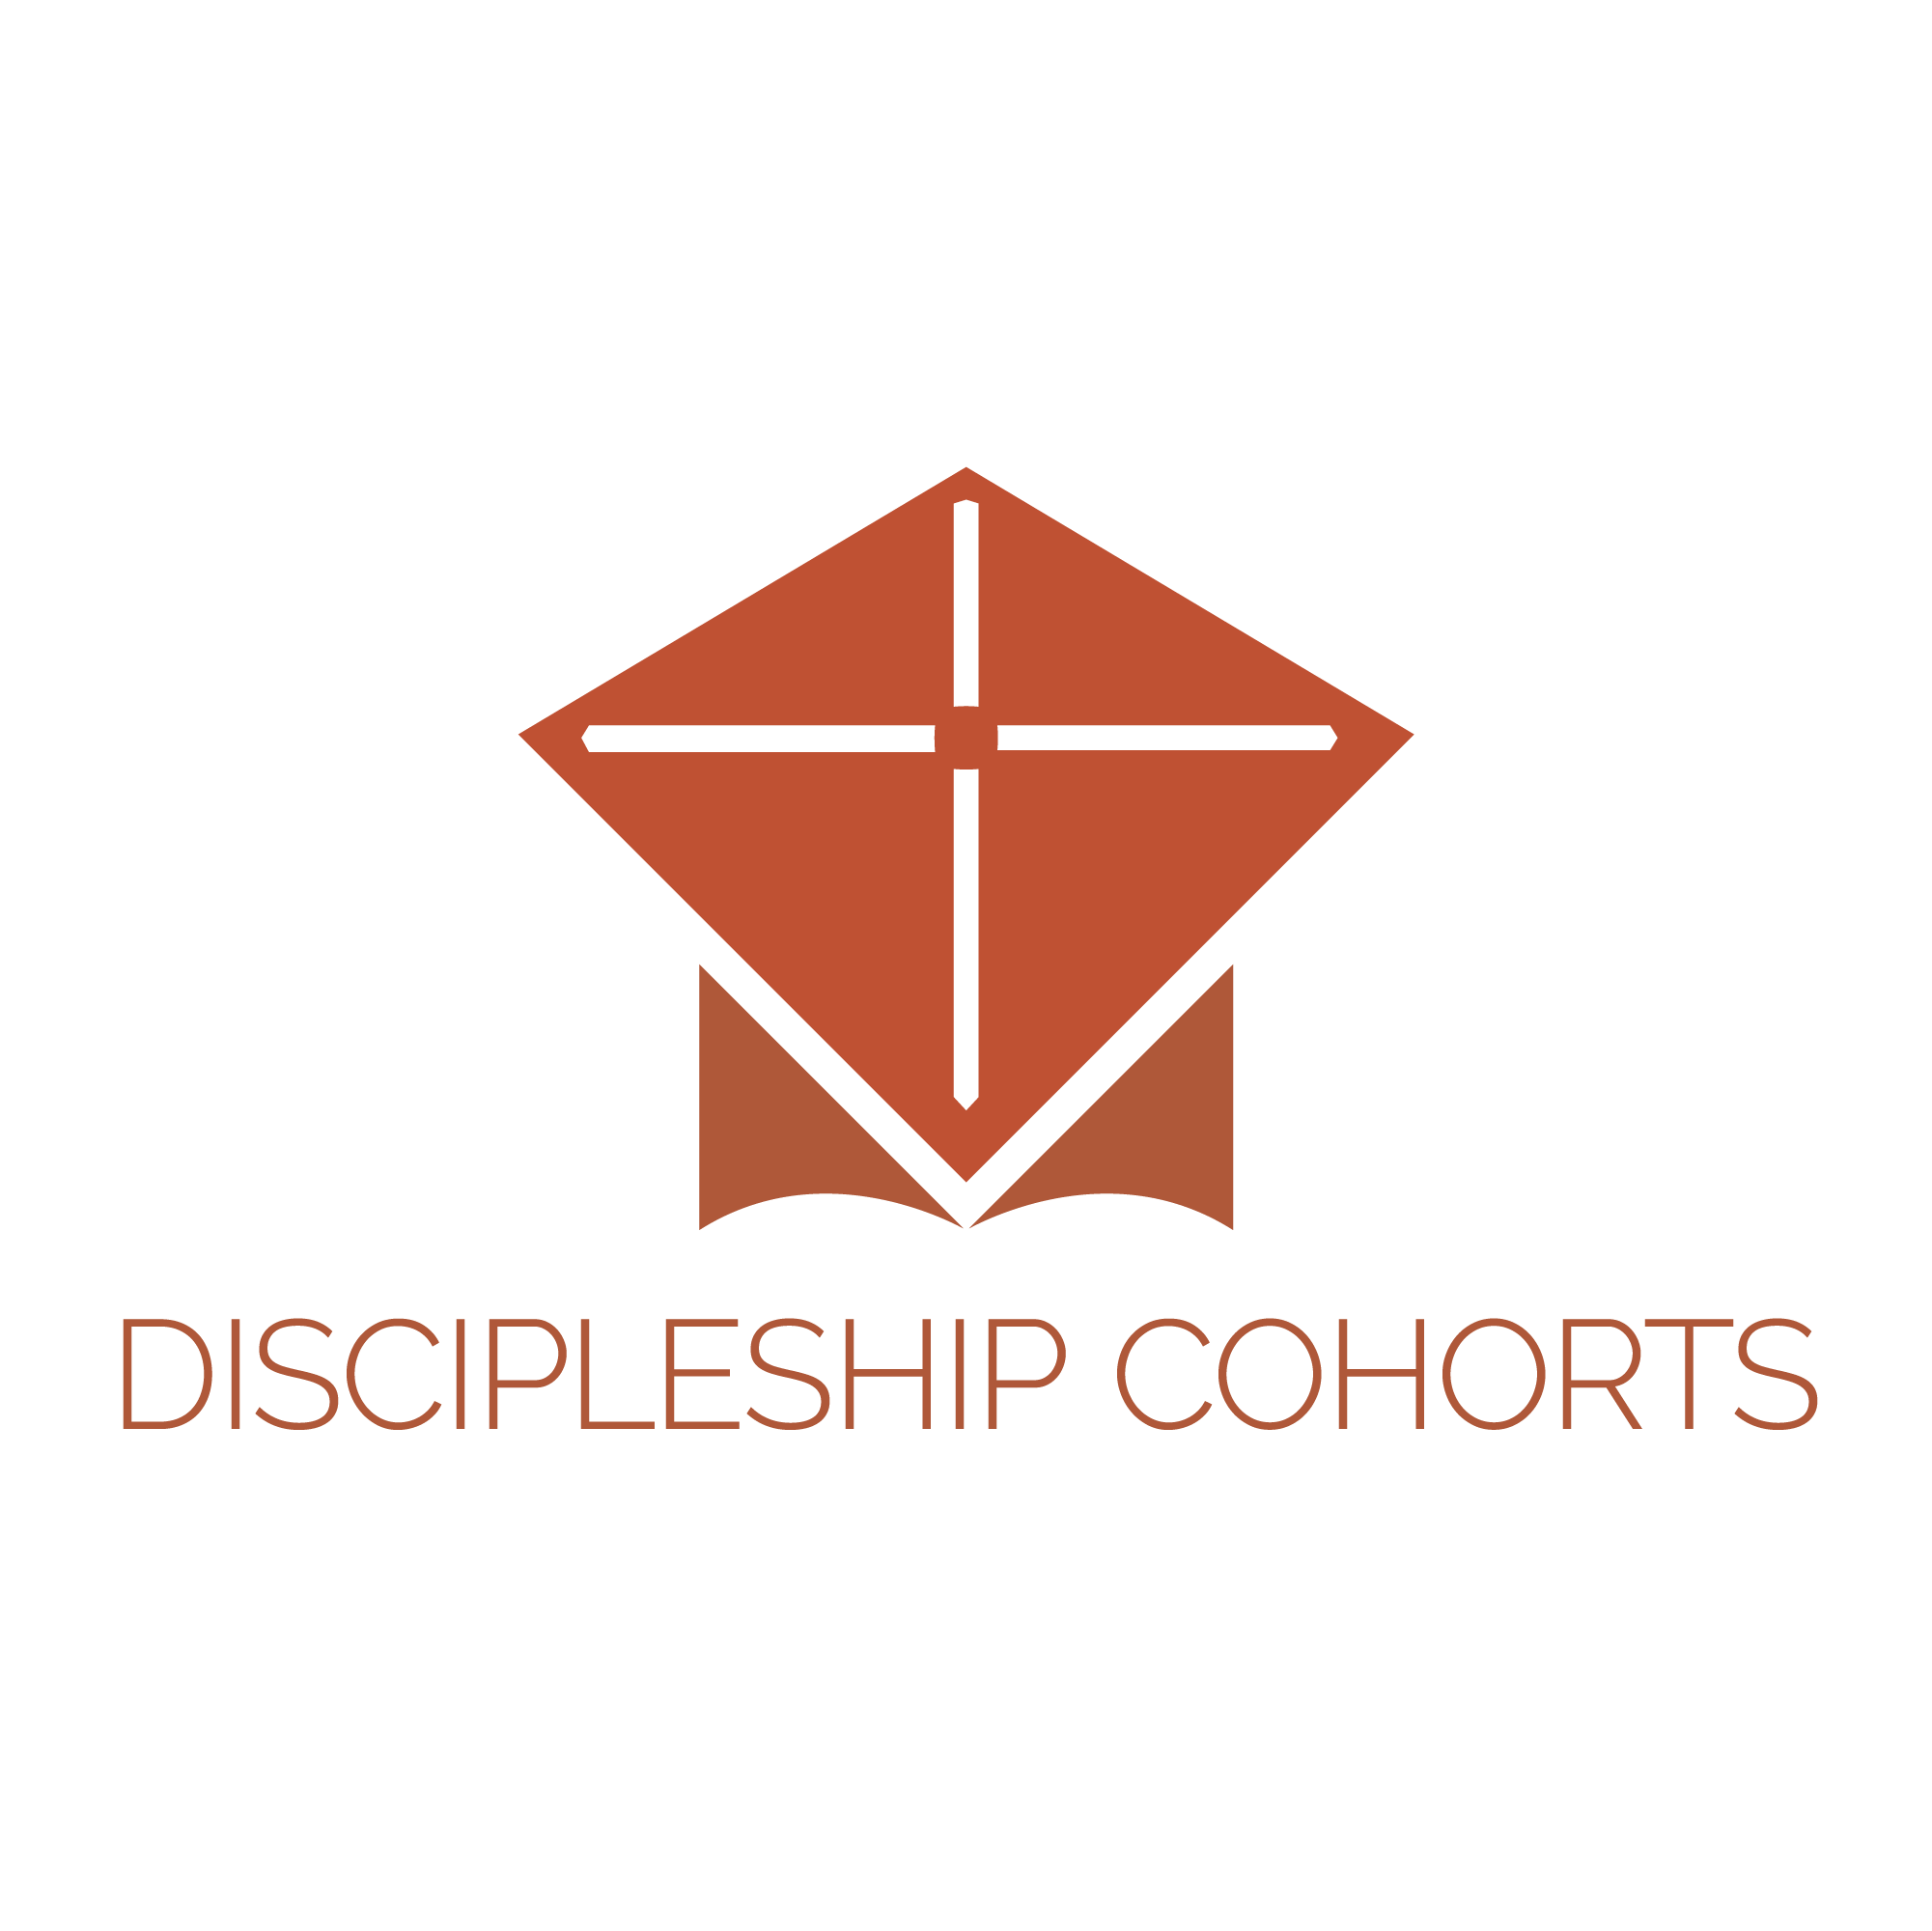 Discipleship_Cohorts_logo_red.png